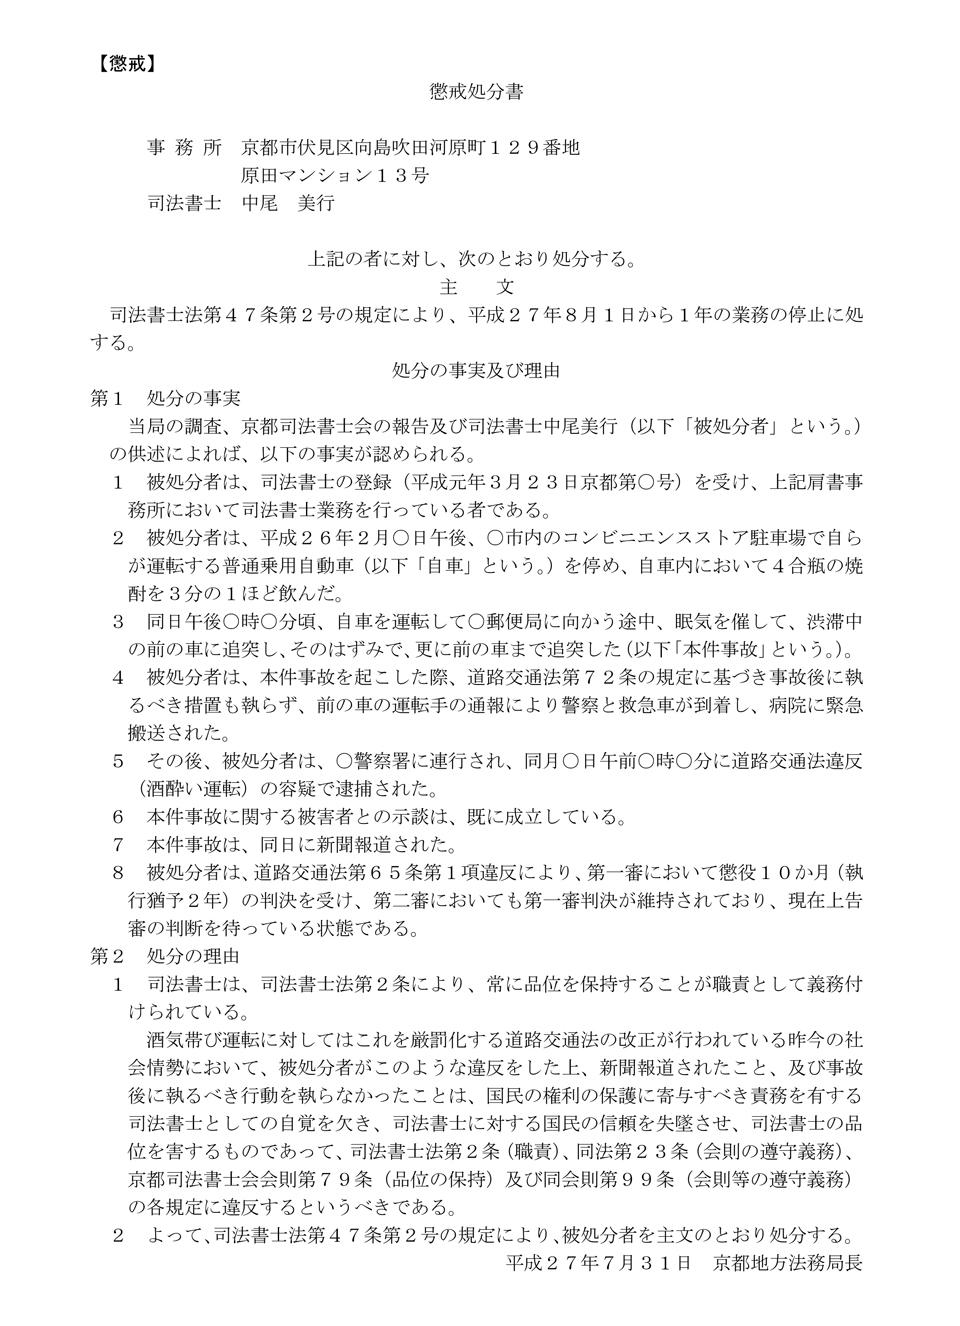 Microsoft Word – 27-07-31 京都地方法務局.docx